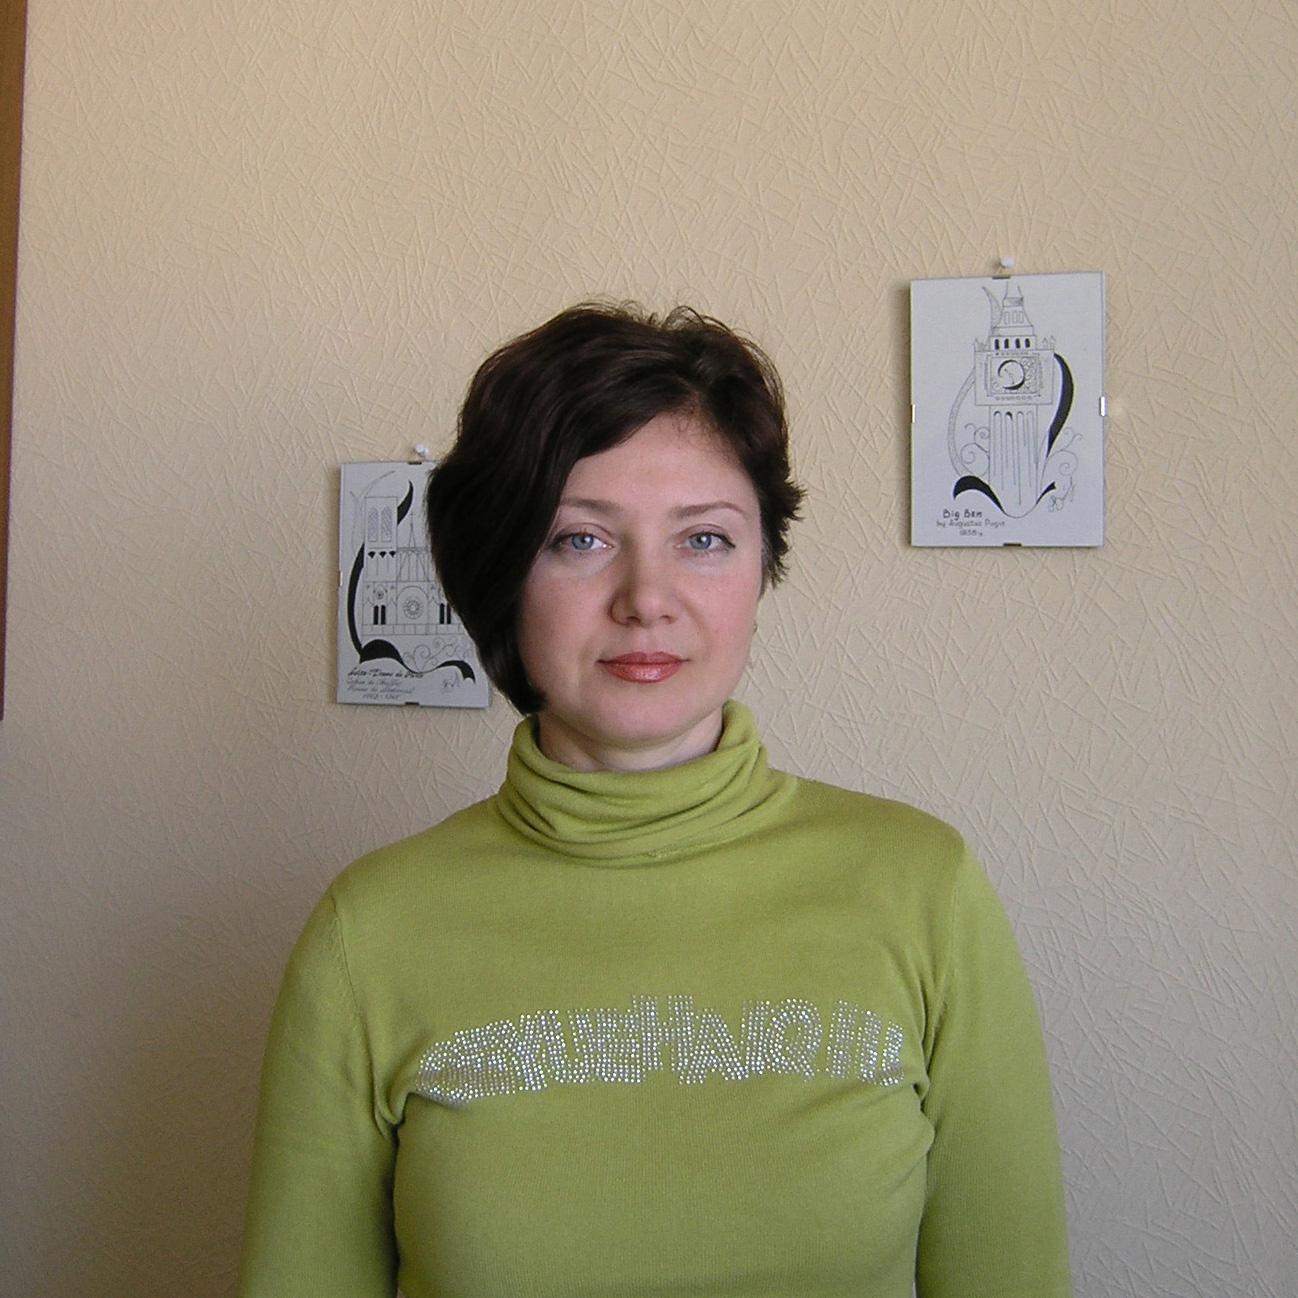 Юридический отдел. Коршунова Юлия Юрьевна